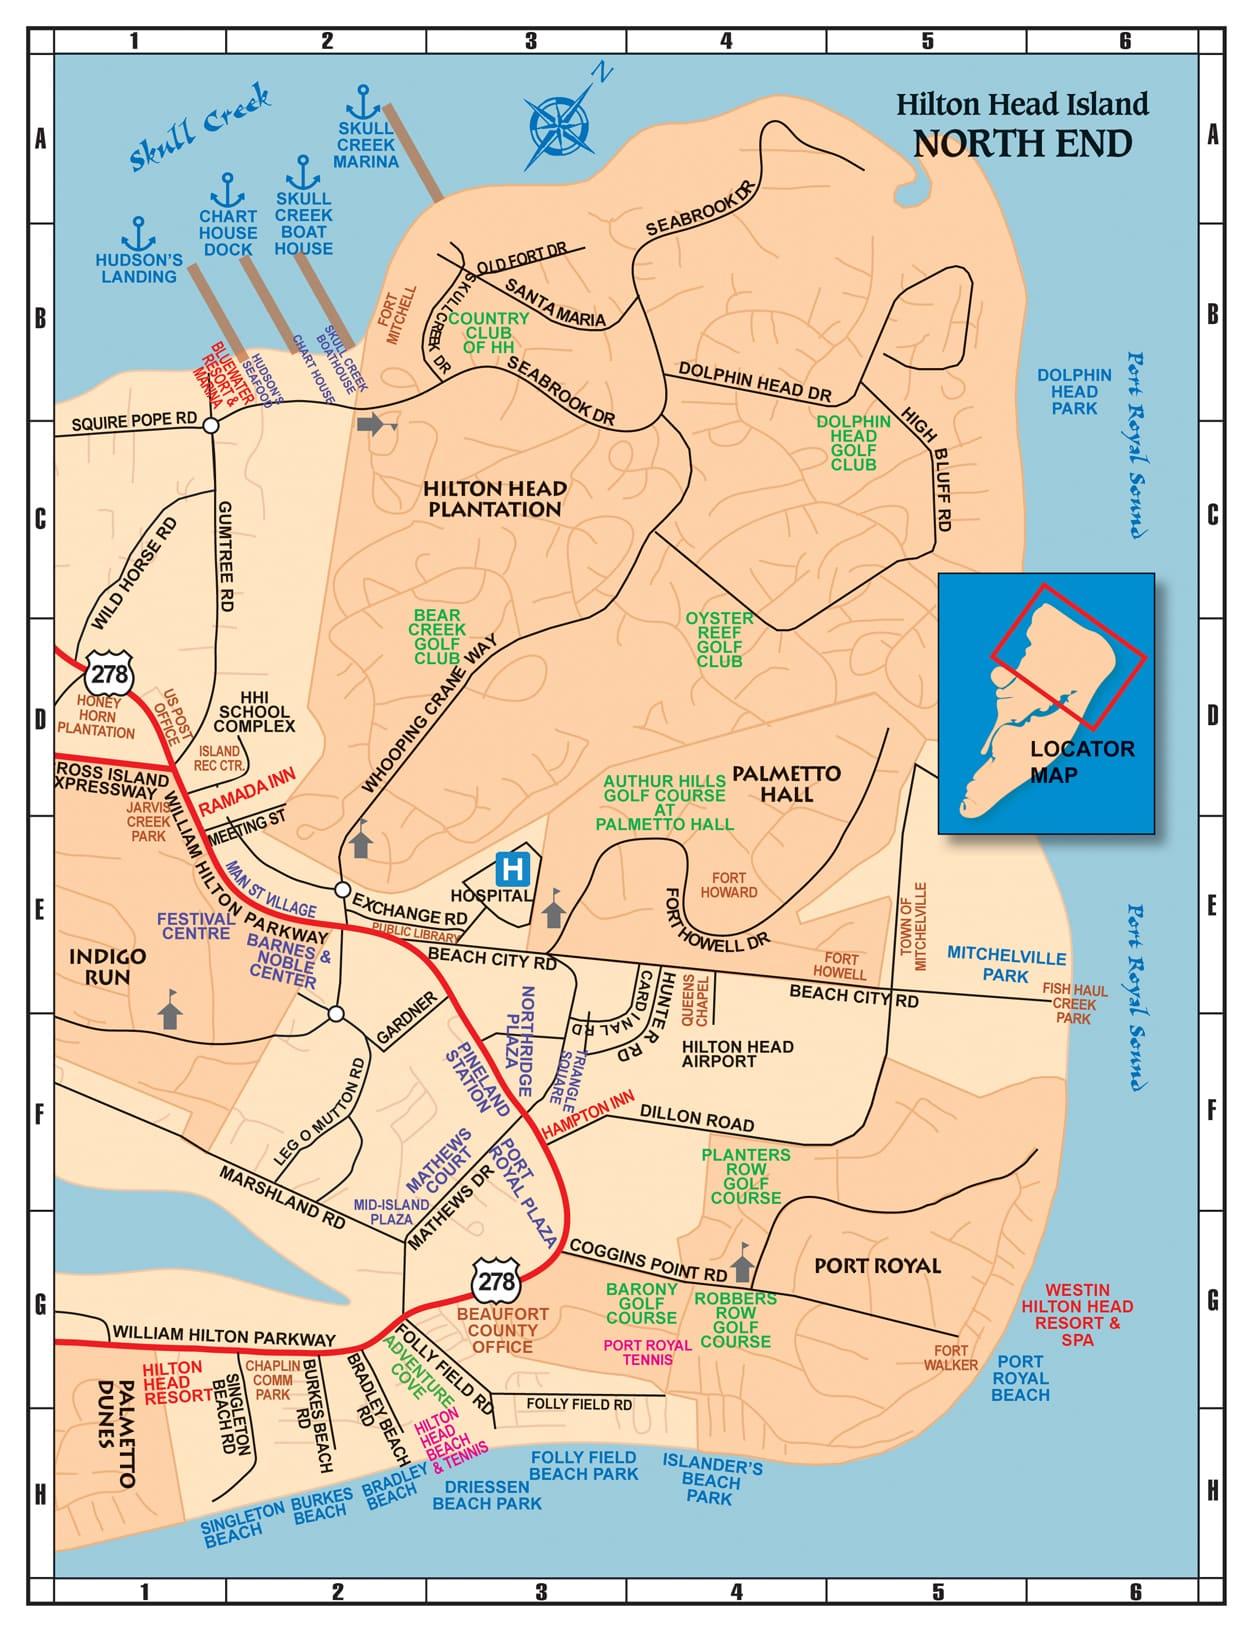 Hilton Head Island South Carolina Map.Maps Of Hilton Head The Lowcountry Savannah 101 Things To Do